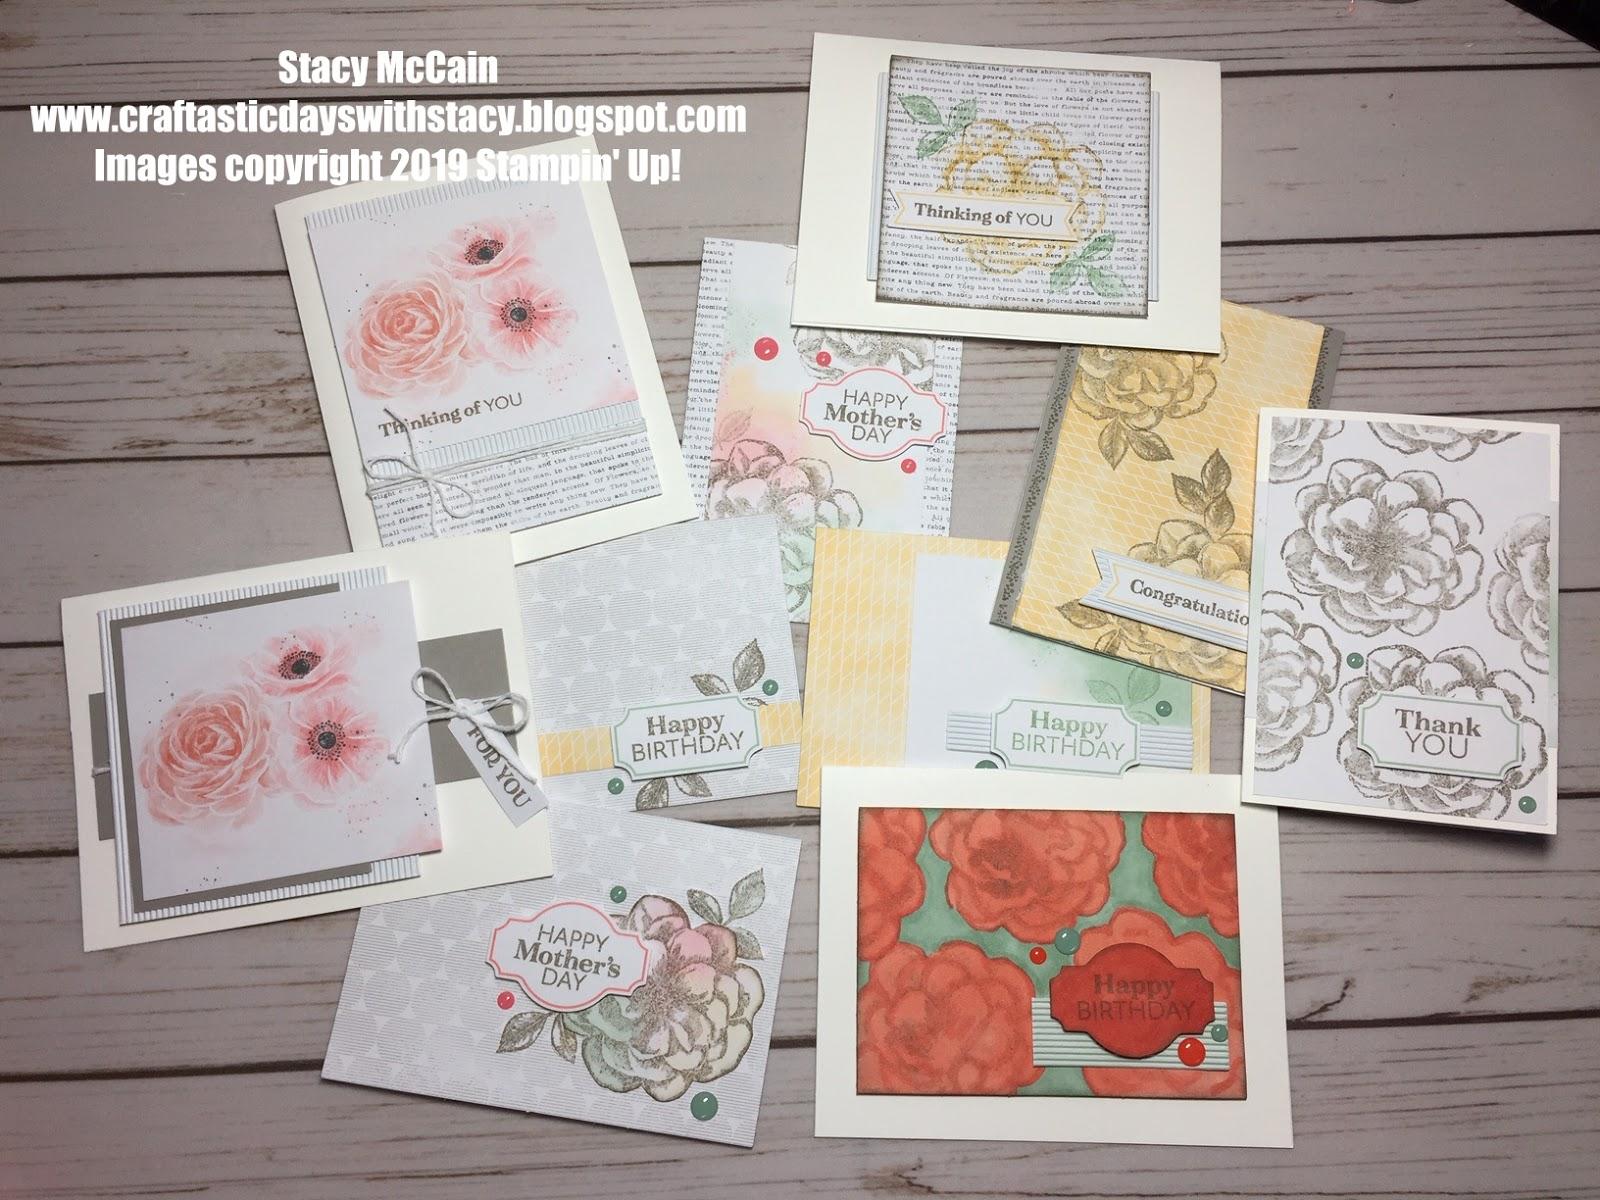 Paper Pumpkin April 2019 Card Ideas Craftastic Days with Stacy: April 2019 Alternative Paper Pumpkin